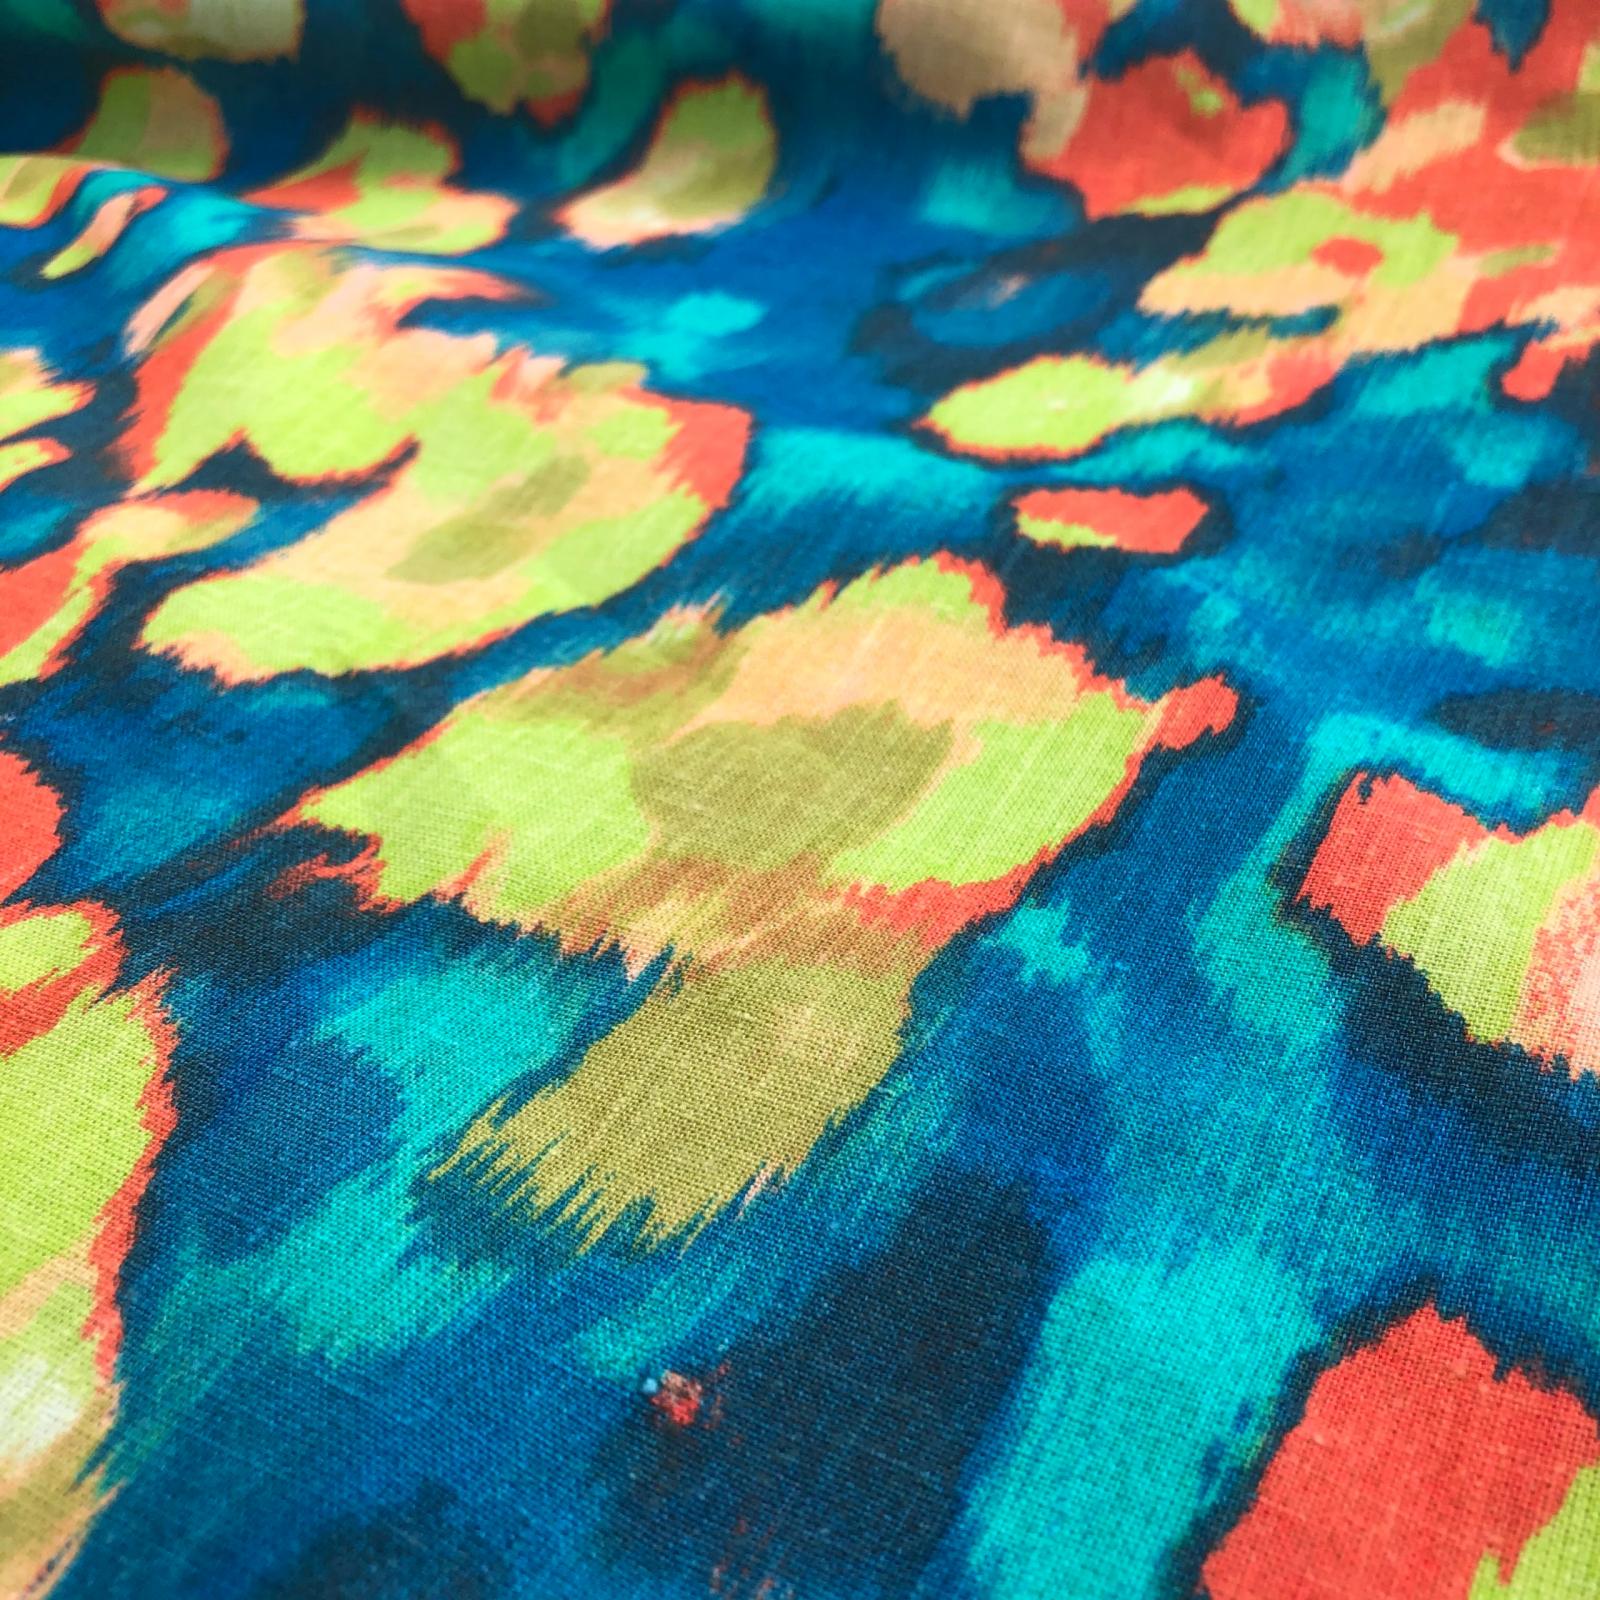 Deadstock Plain Weave Hemp / Organic Cotton - Orange/Teal